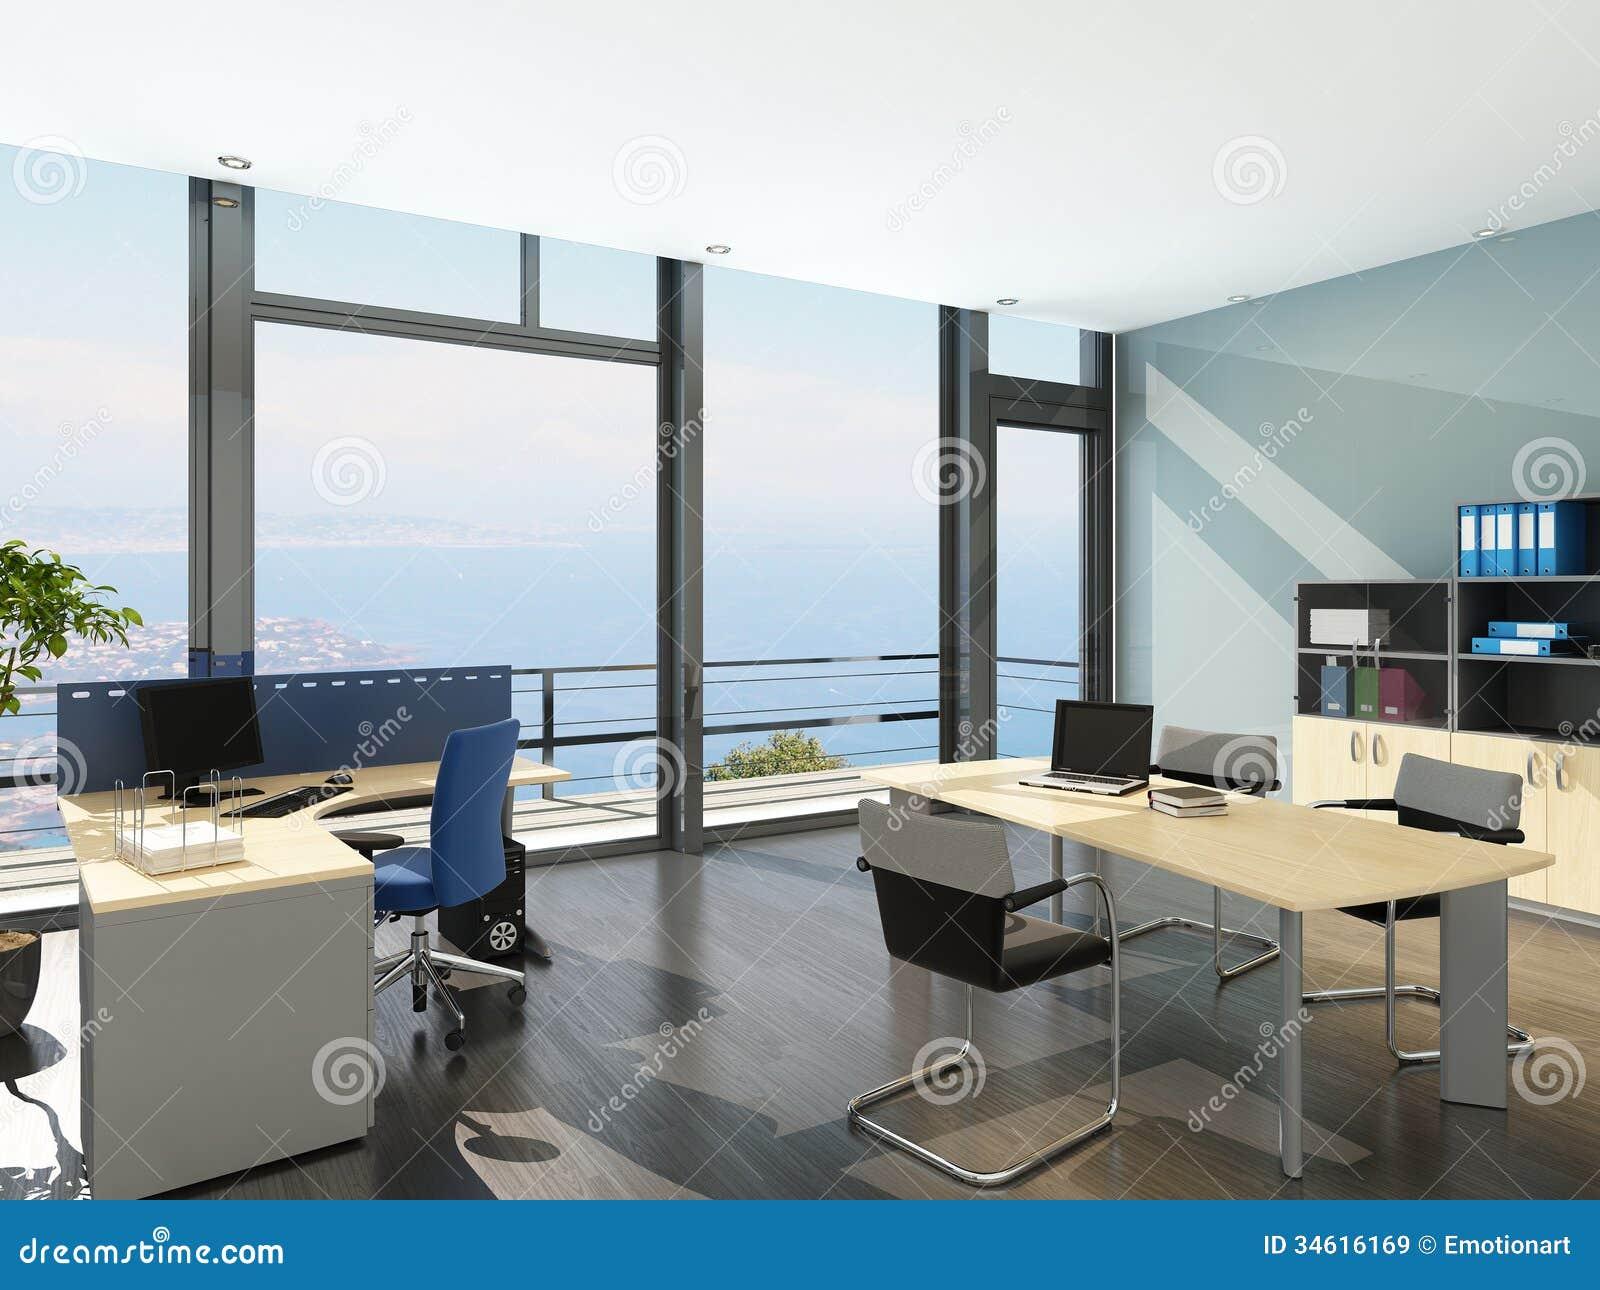 Modern office interior with spledid seascape view